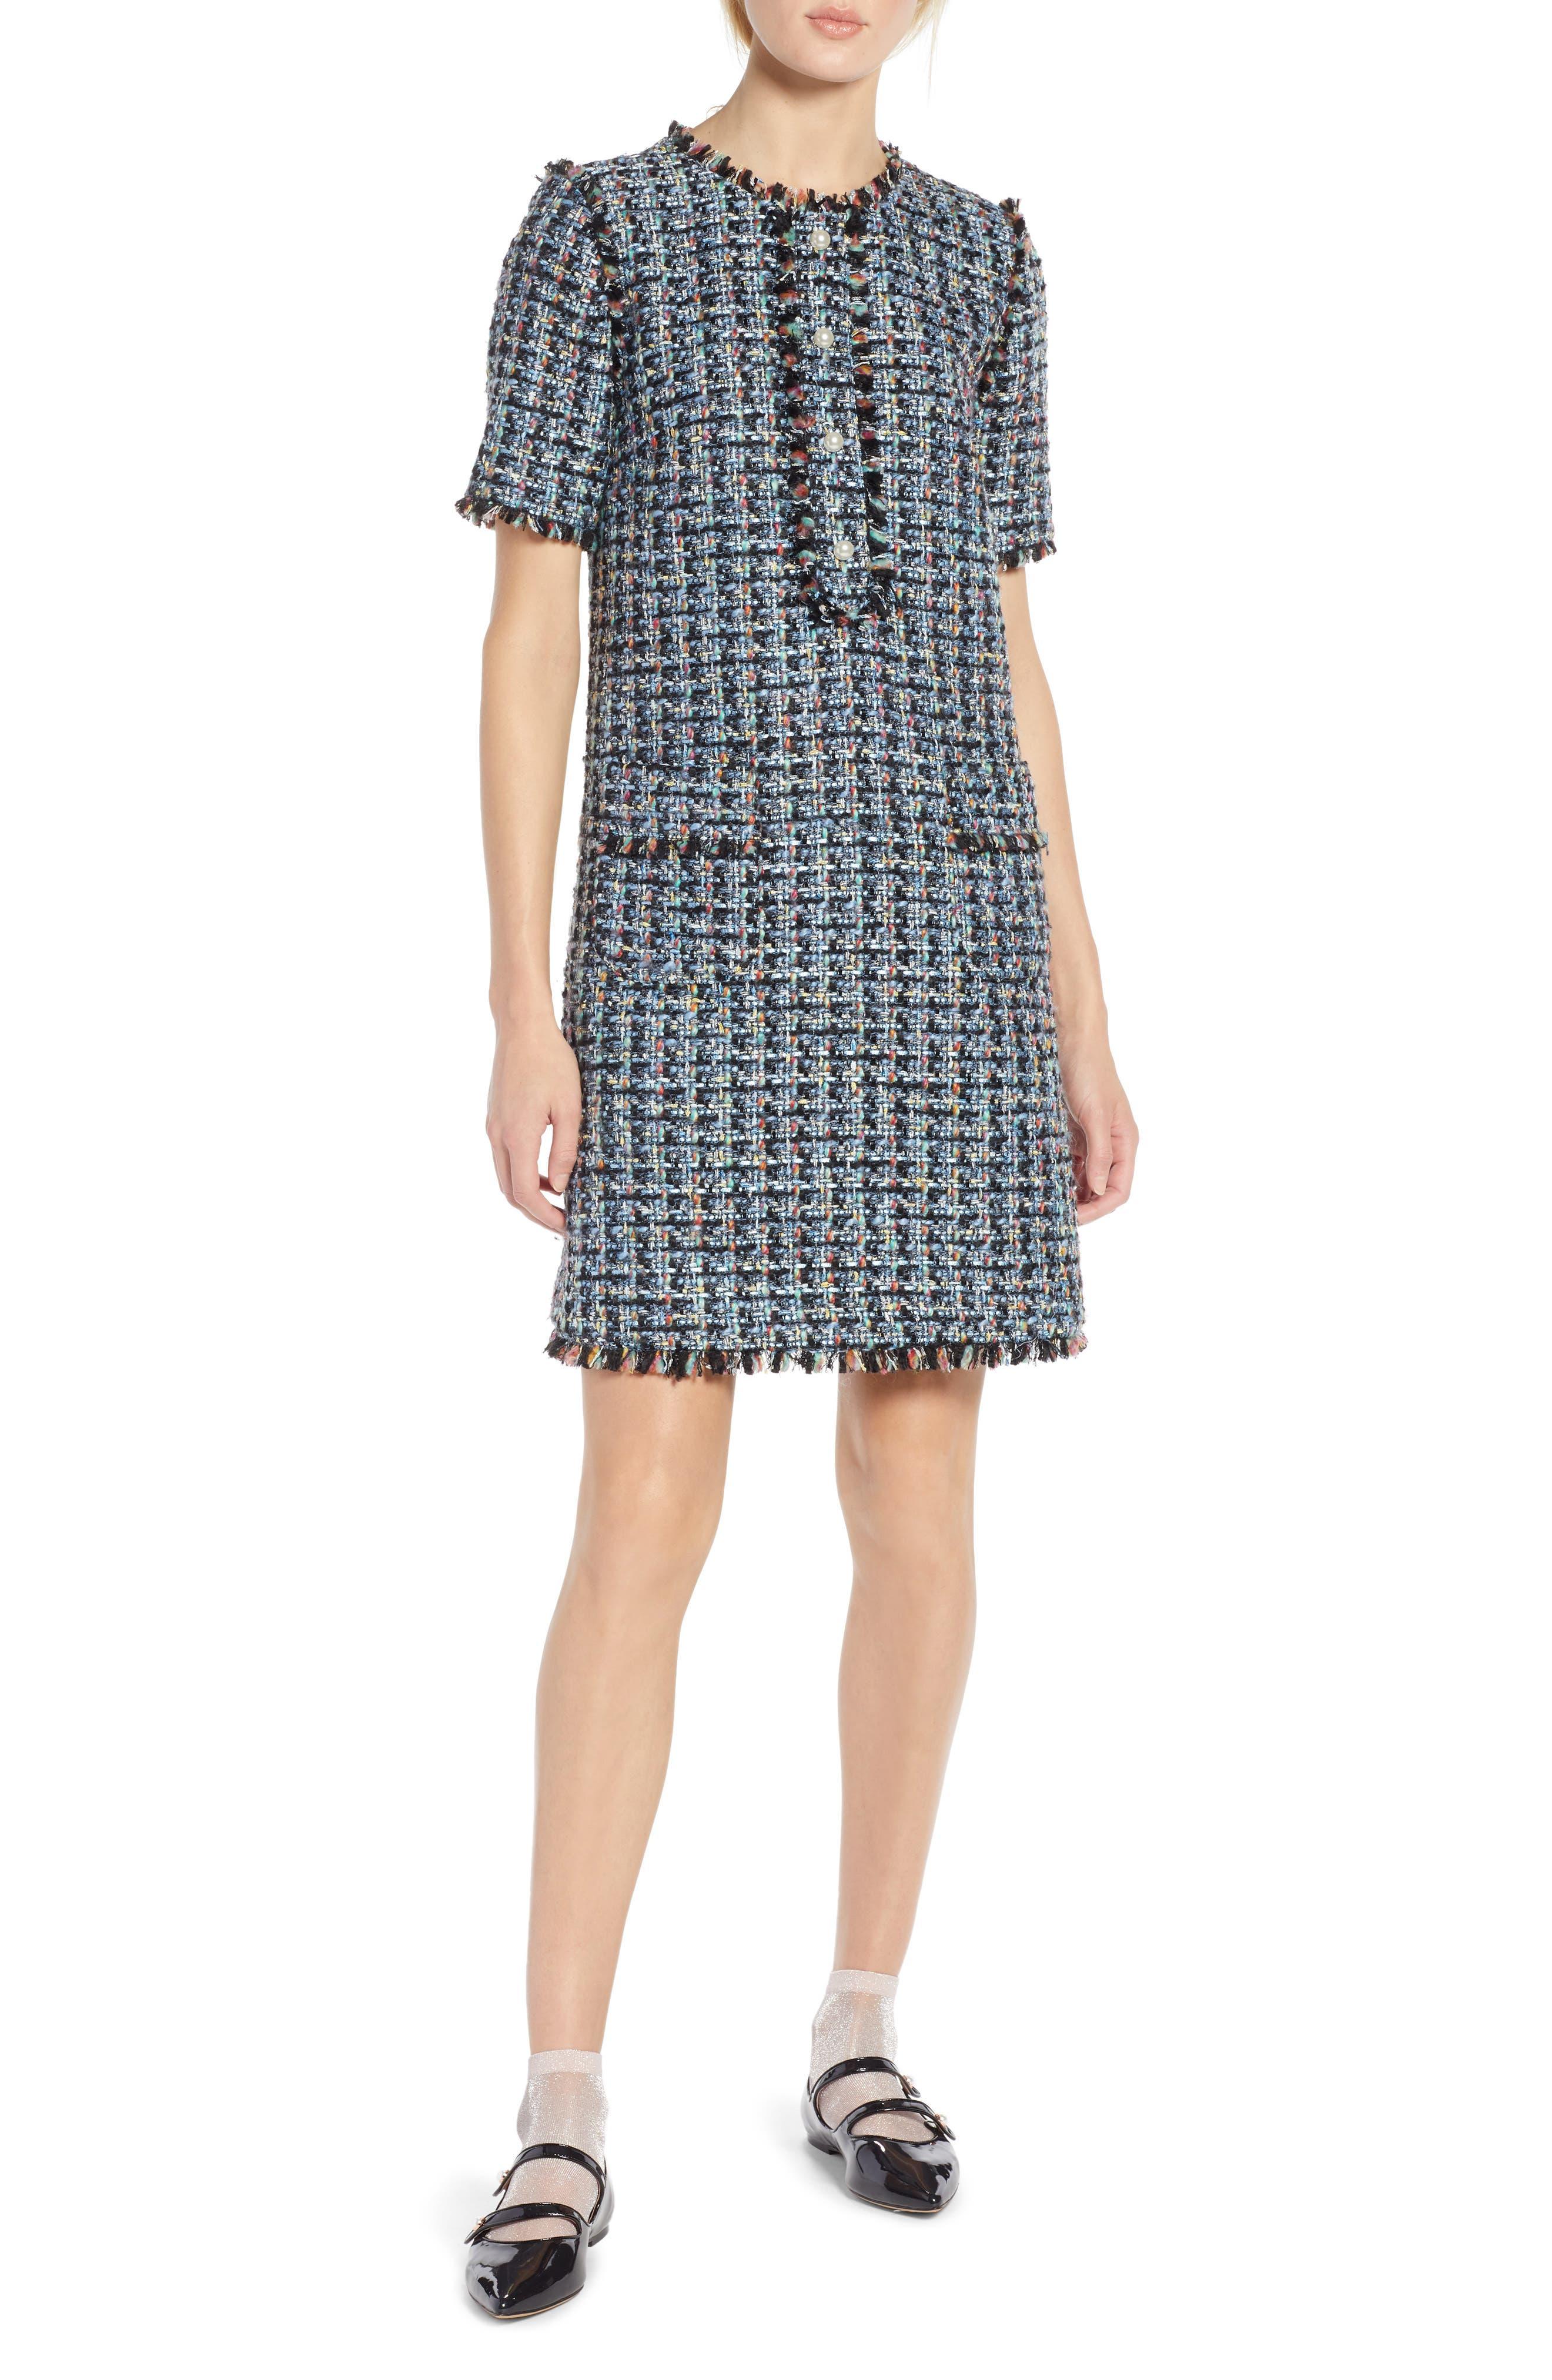 x Atlantic-Pacific Fringe Tweed Dress,                             Main thumbnail 1, color,                             BLACK MULTI TWEED